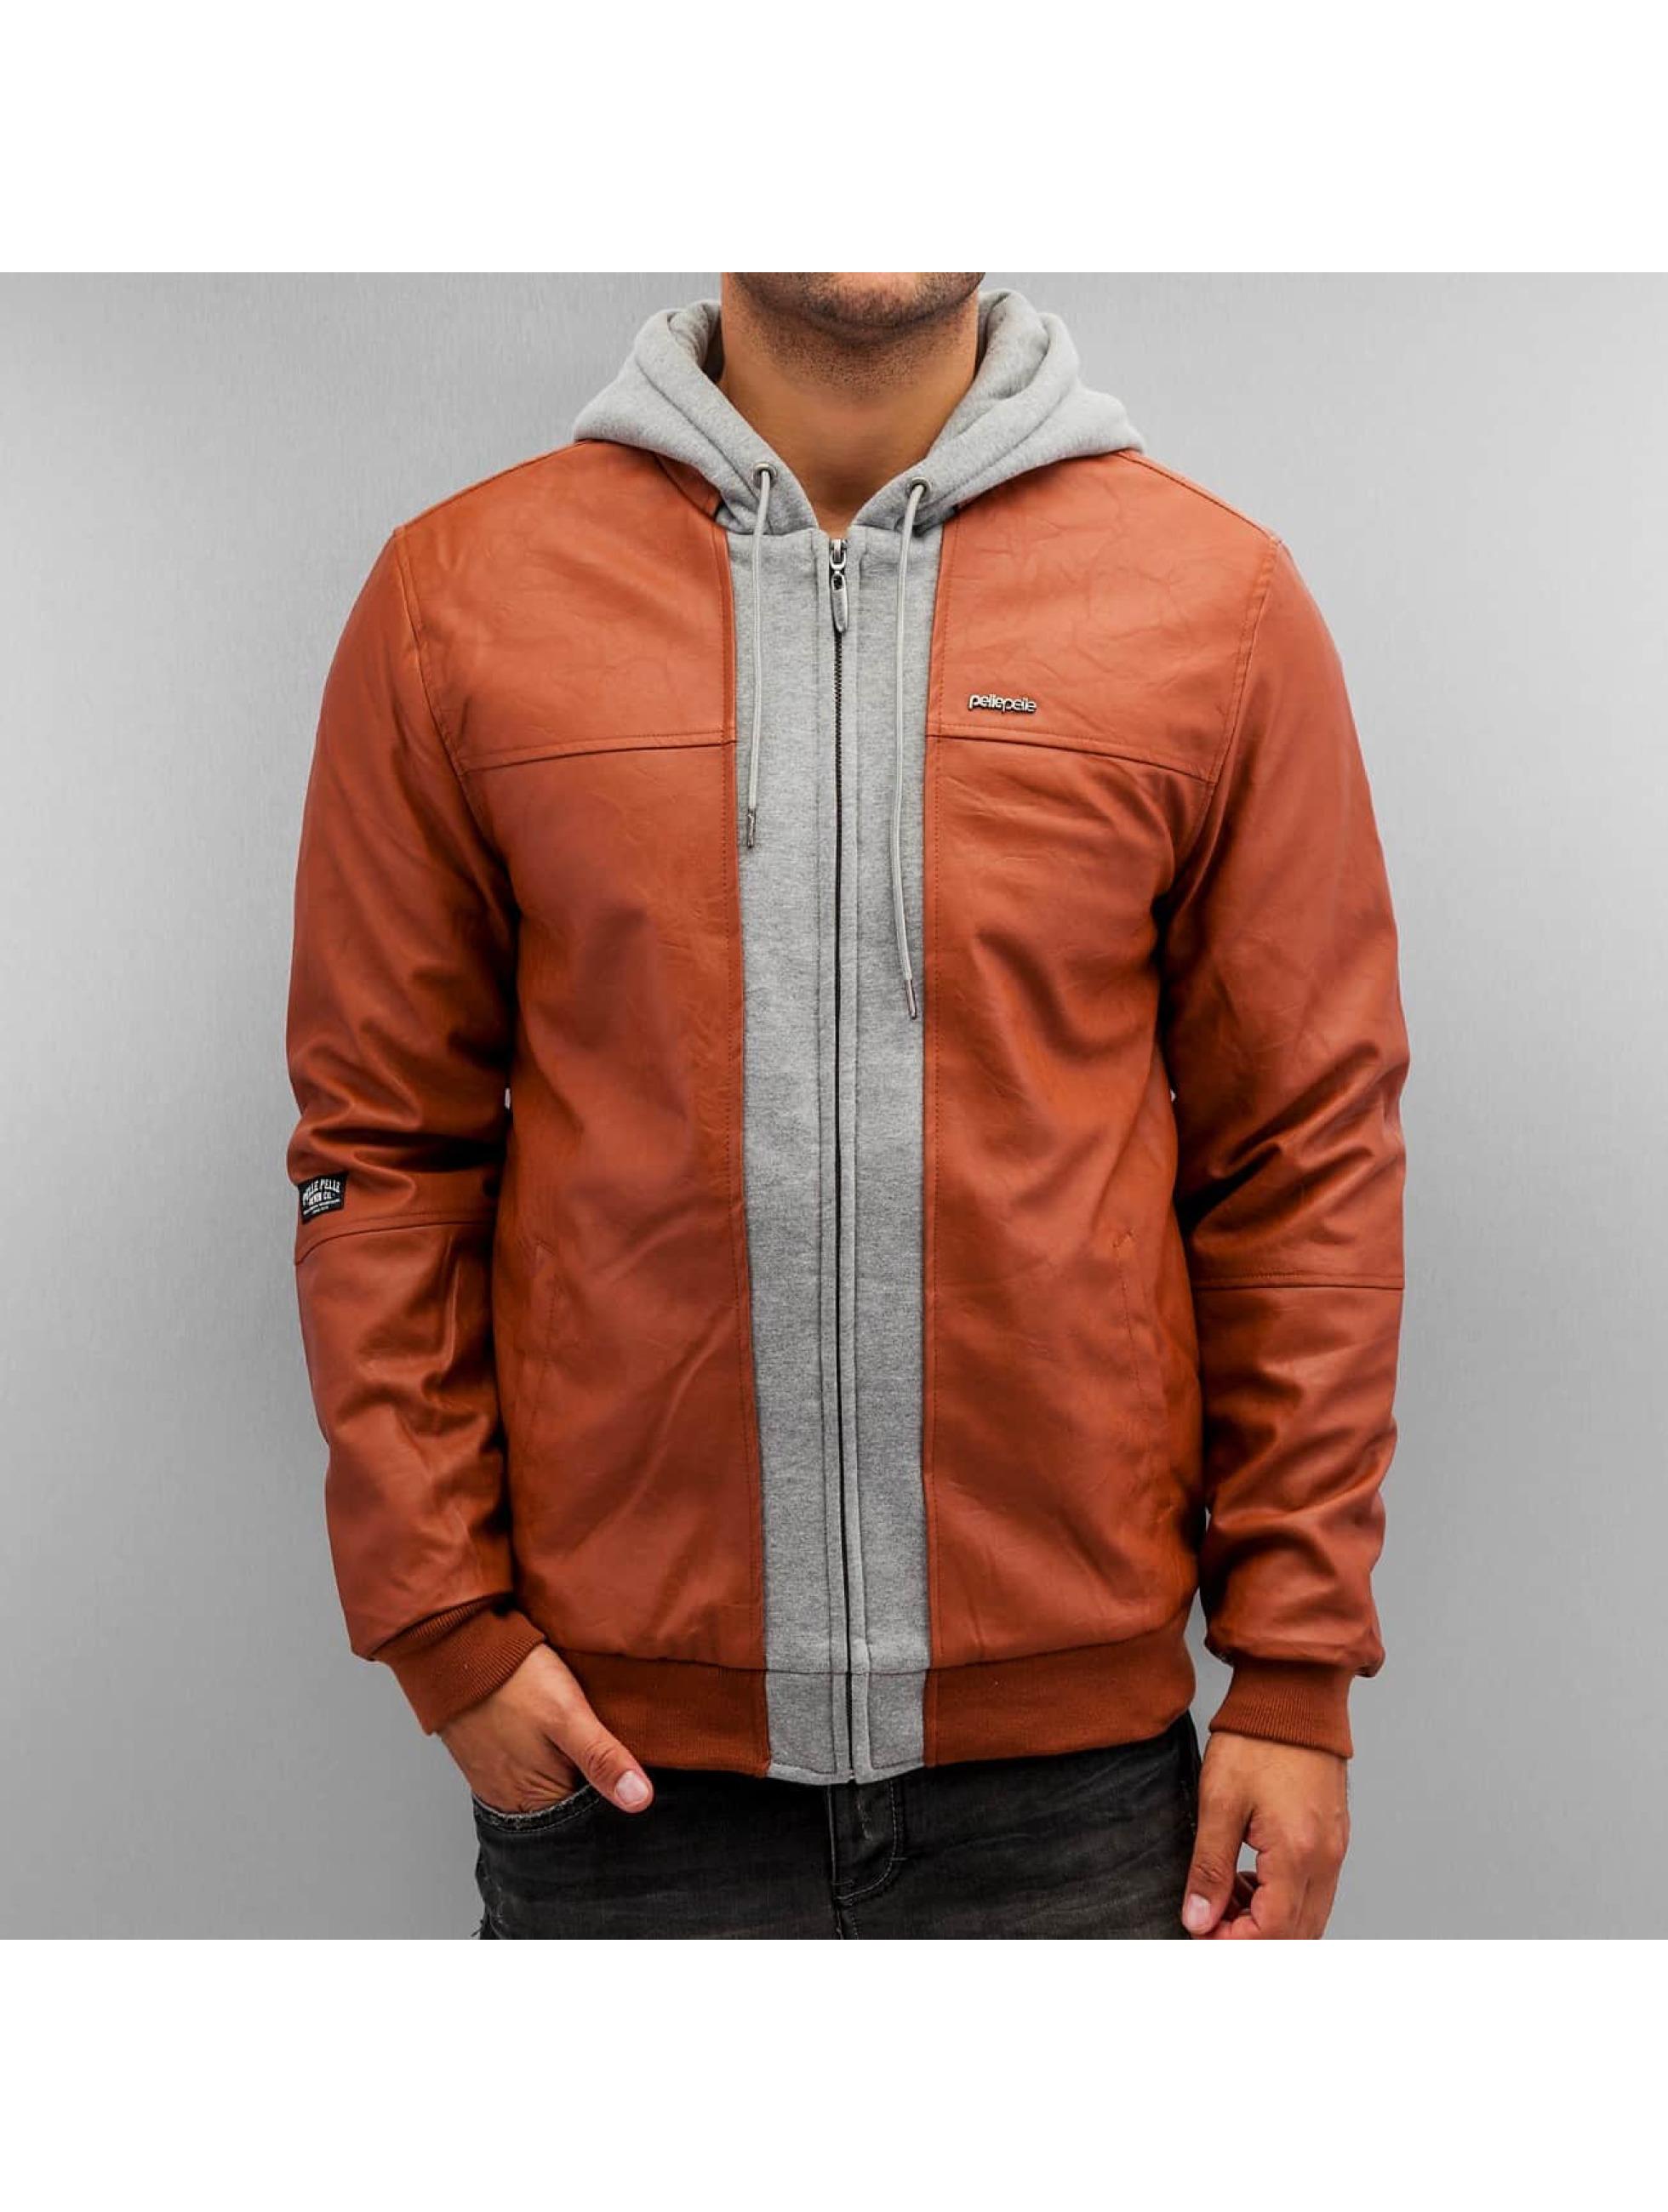 Pelle Pelle Кожаная куртка Mix-Up коричневый